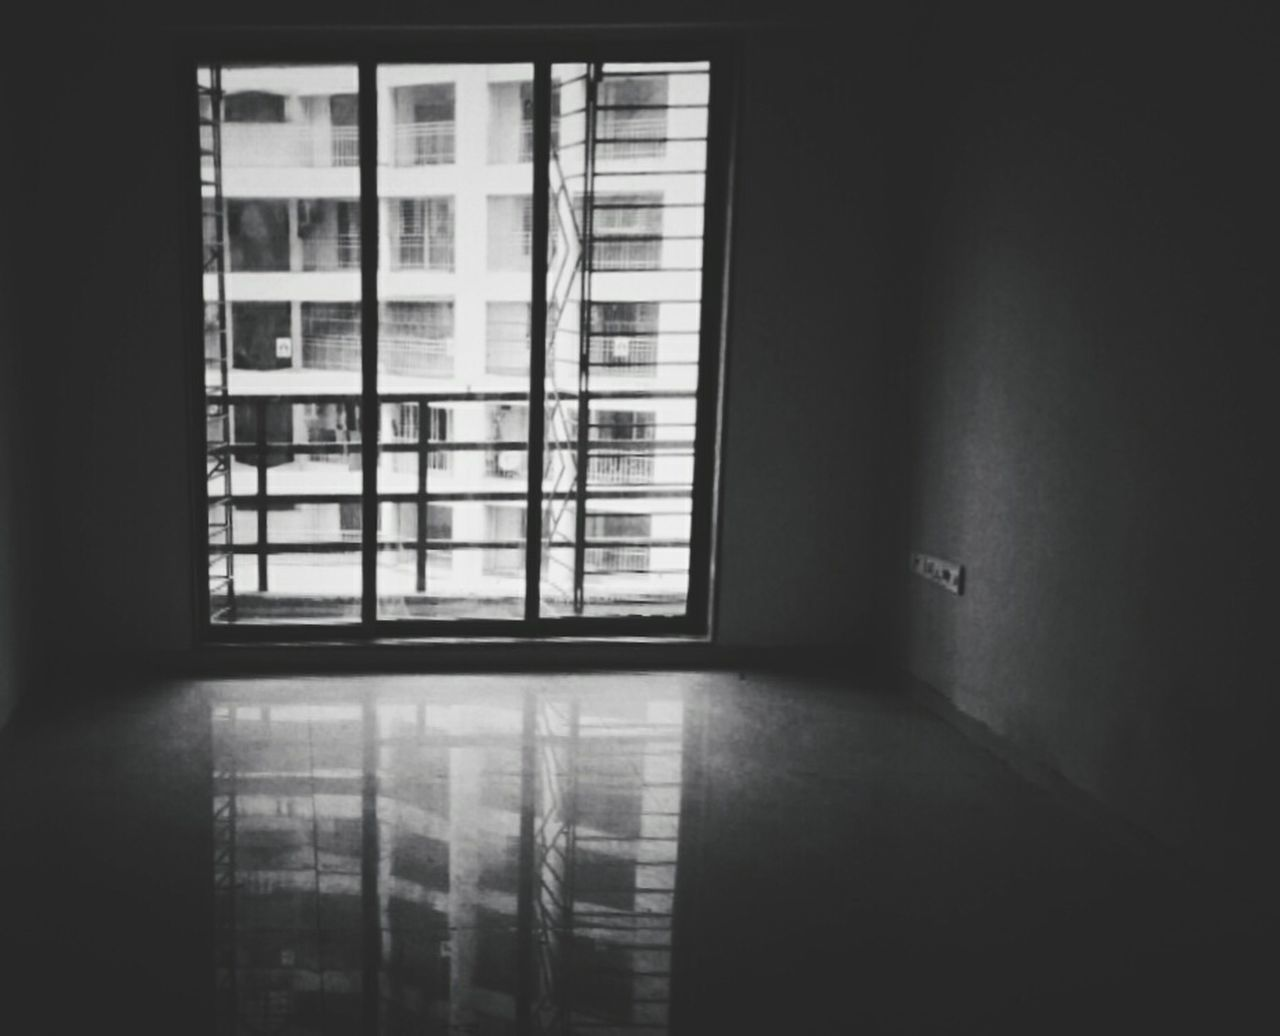 Window Indoors  No People Dark Day Domestic Room Sliding Door AWESOME!!